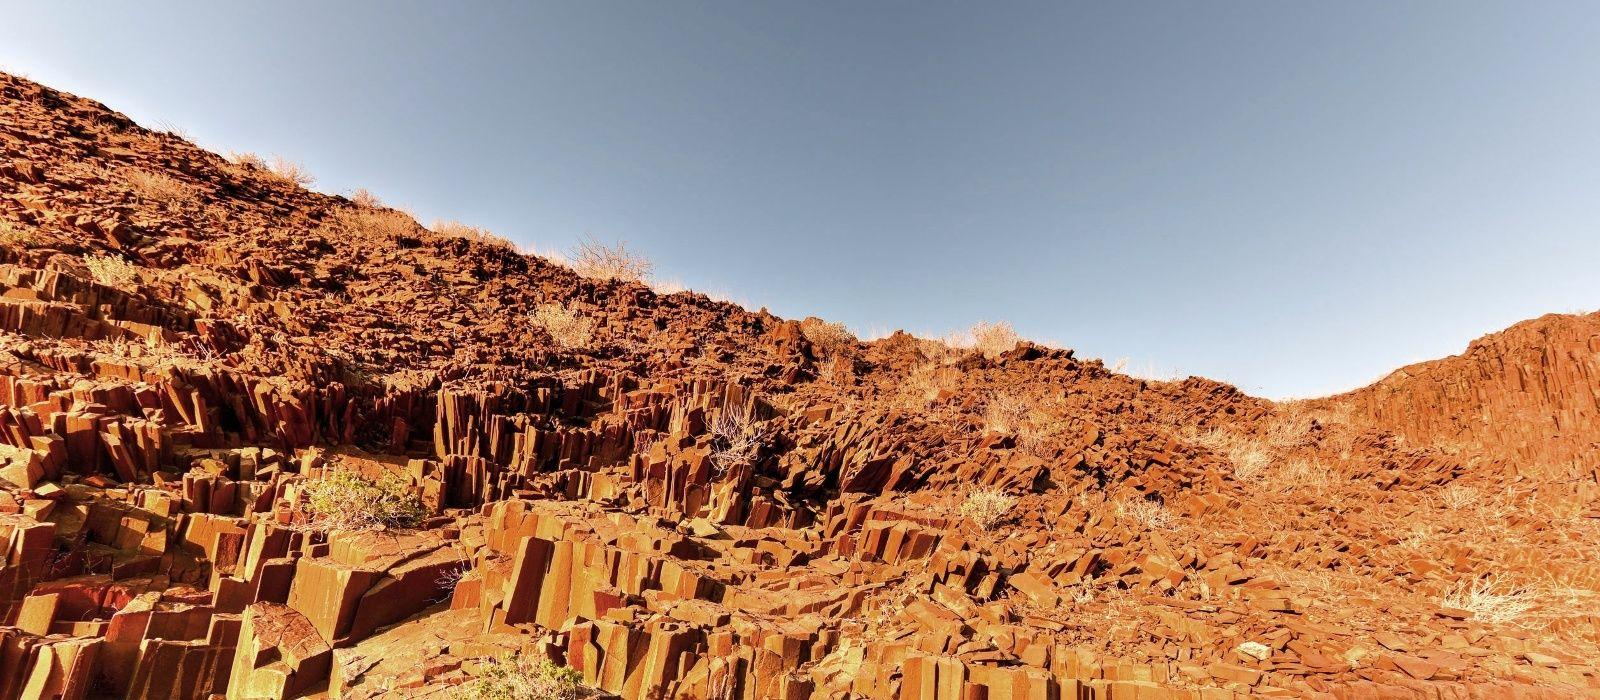 Reiseziel Damaraland (Palmwag) Namibia